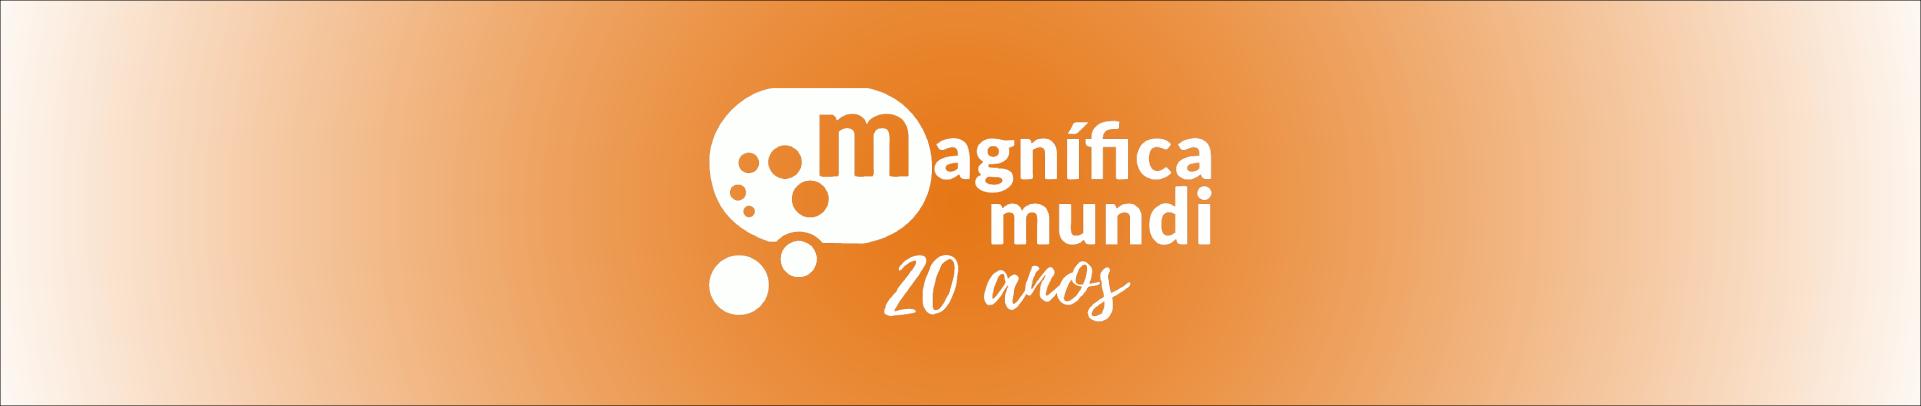 Magnífica Mundi 20 anos